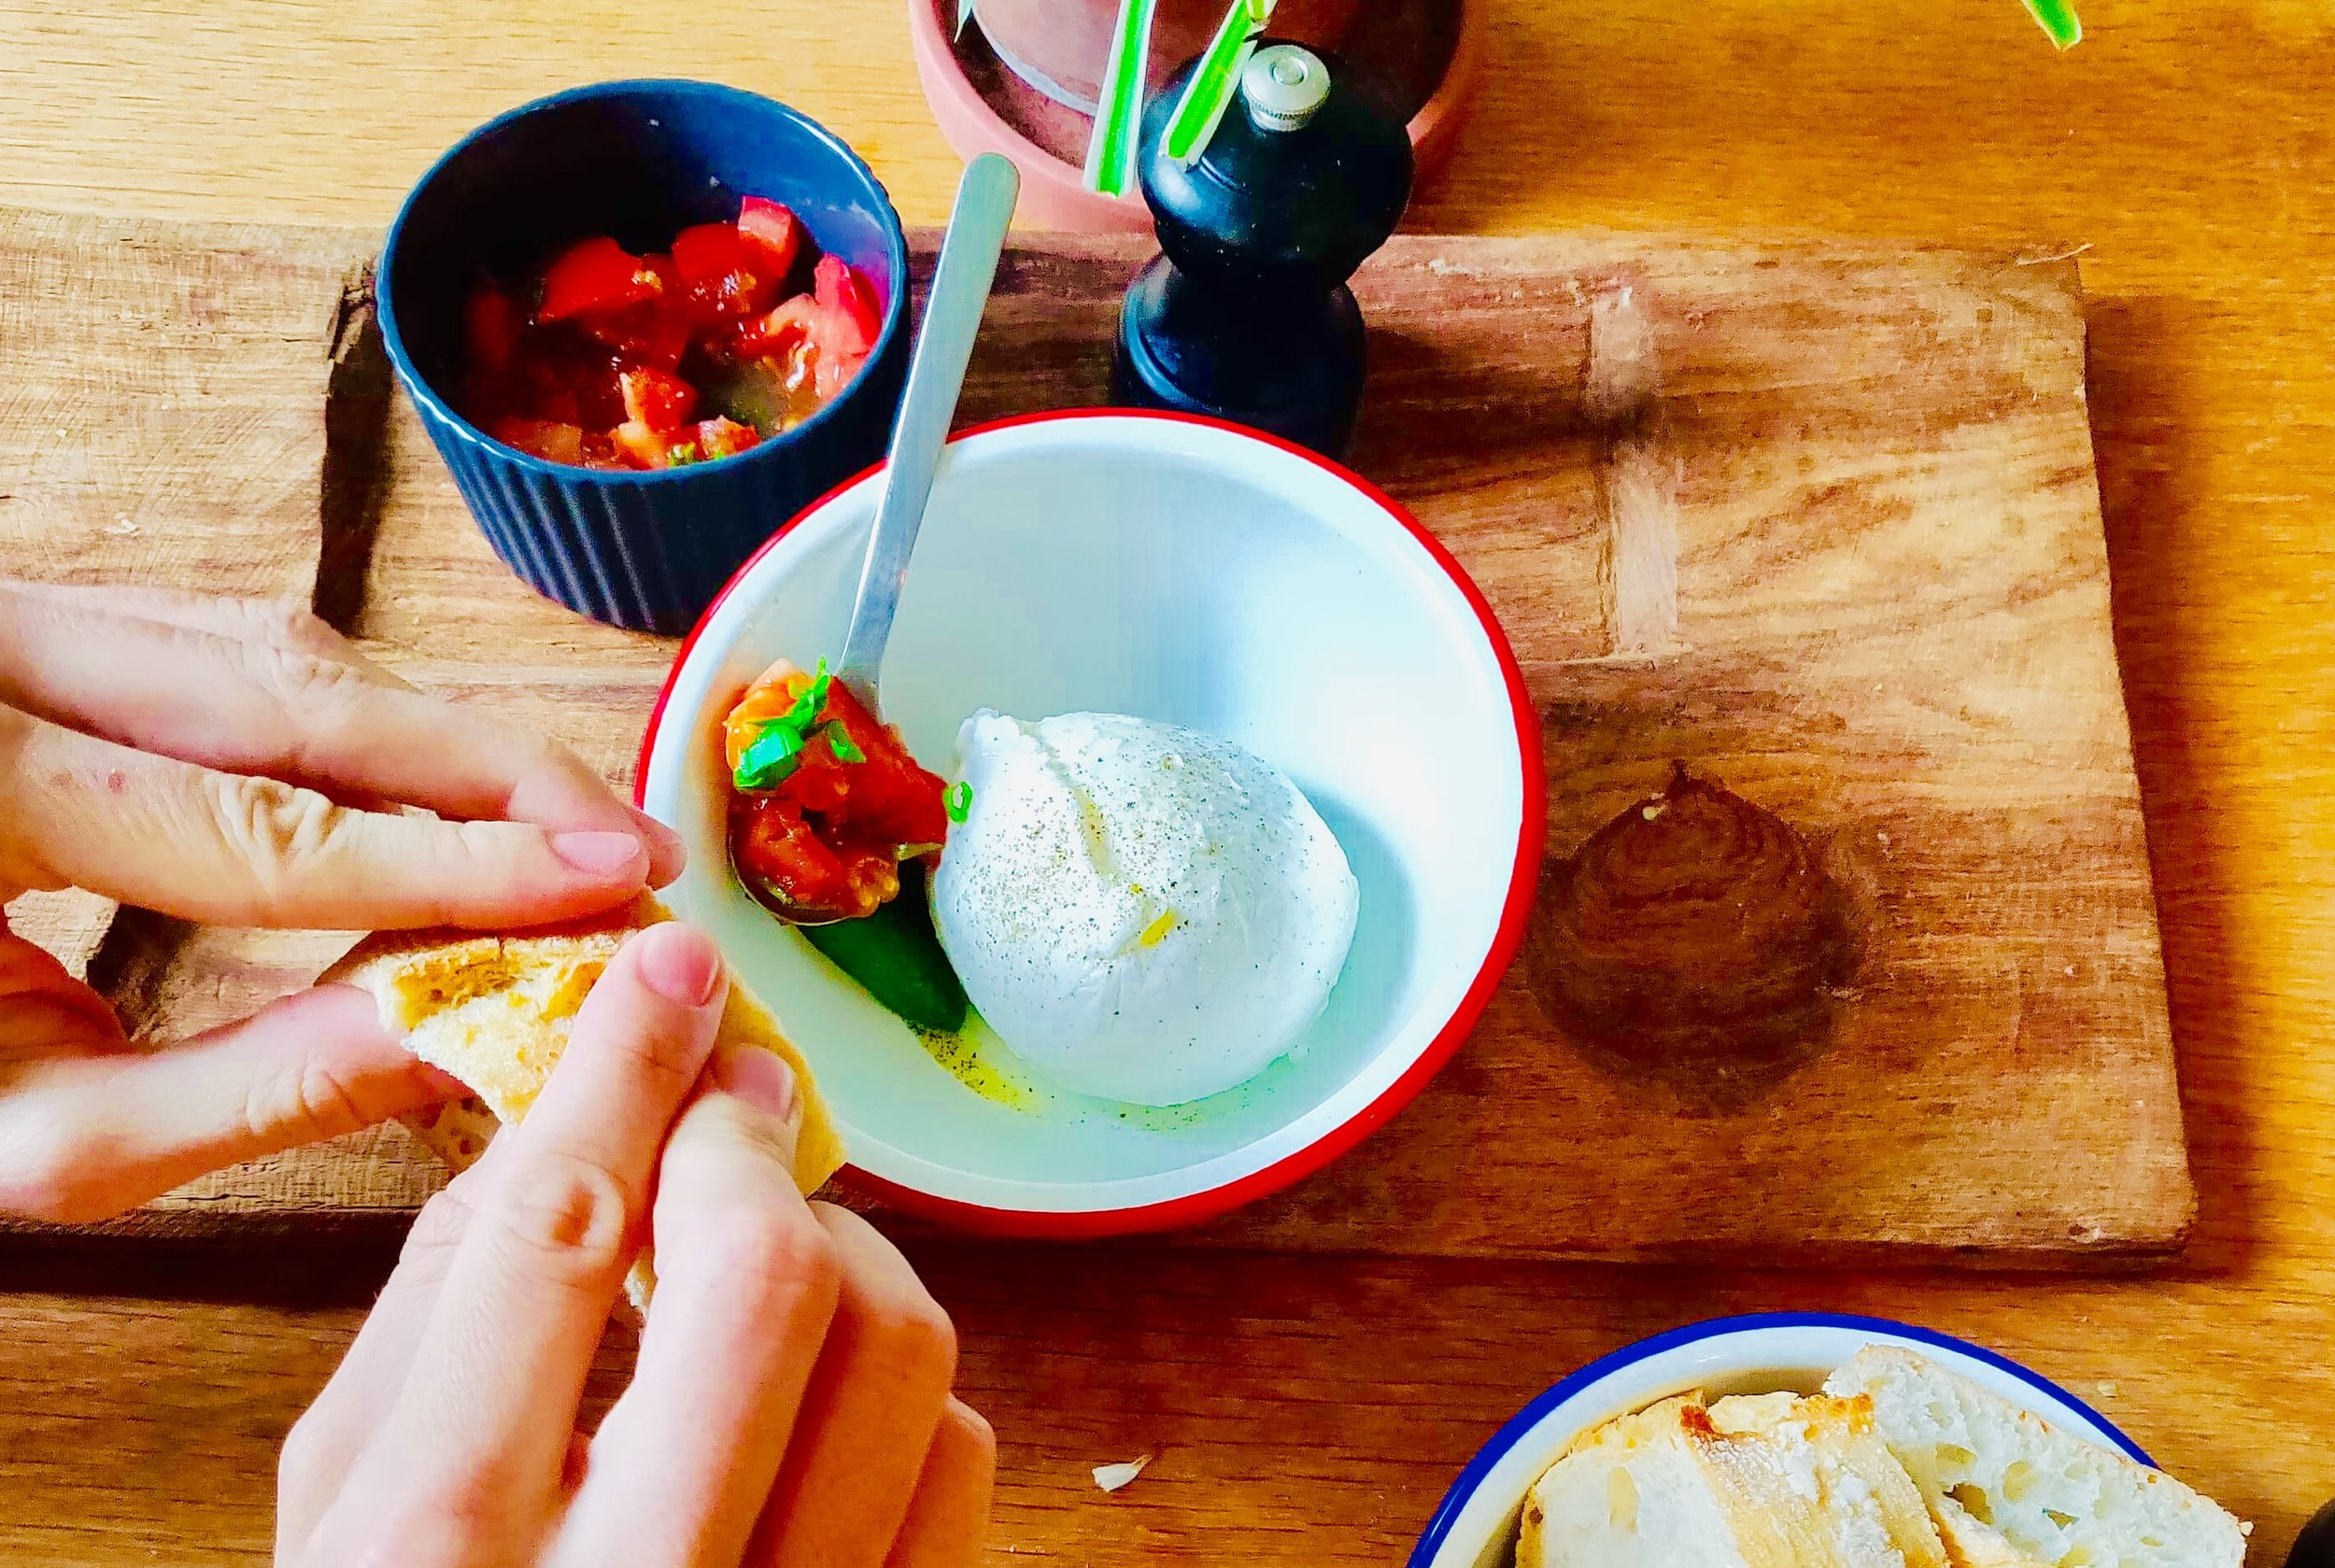 Burrata, tartare de tomates, basilic - Chutney de tomates, gingembre & piment d'Espelette